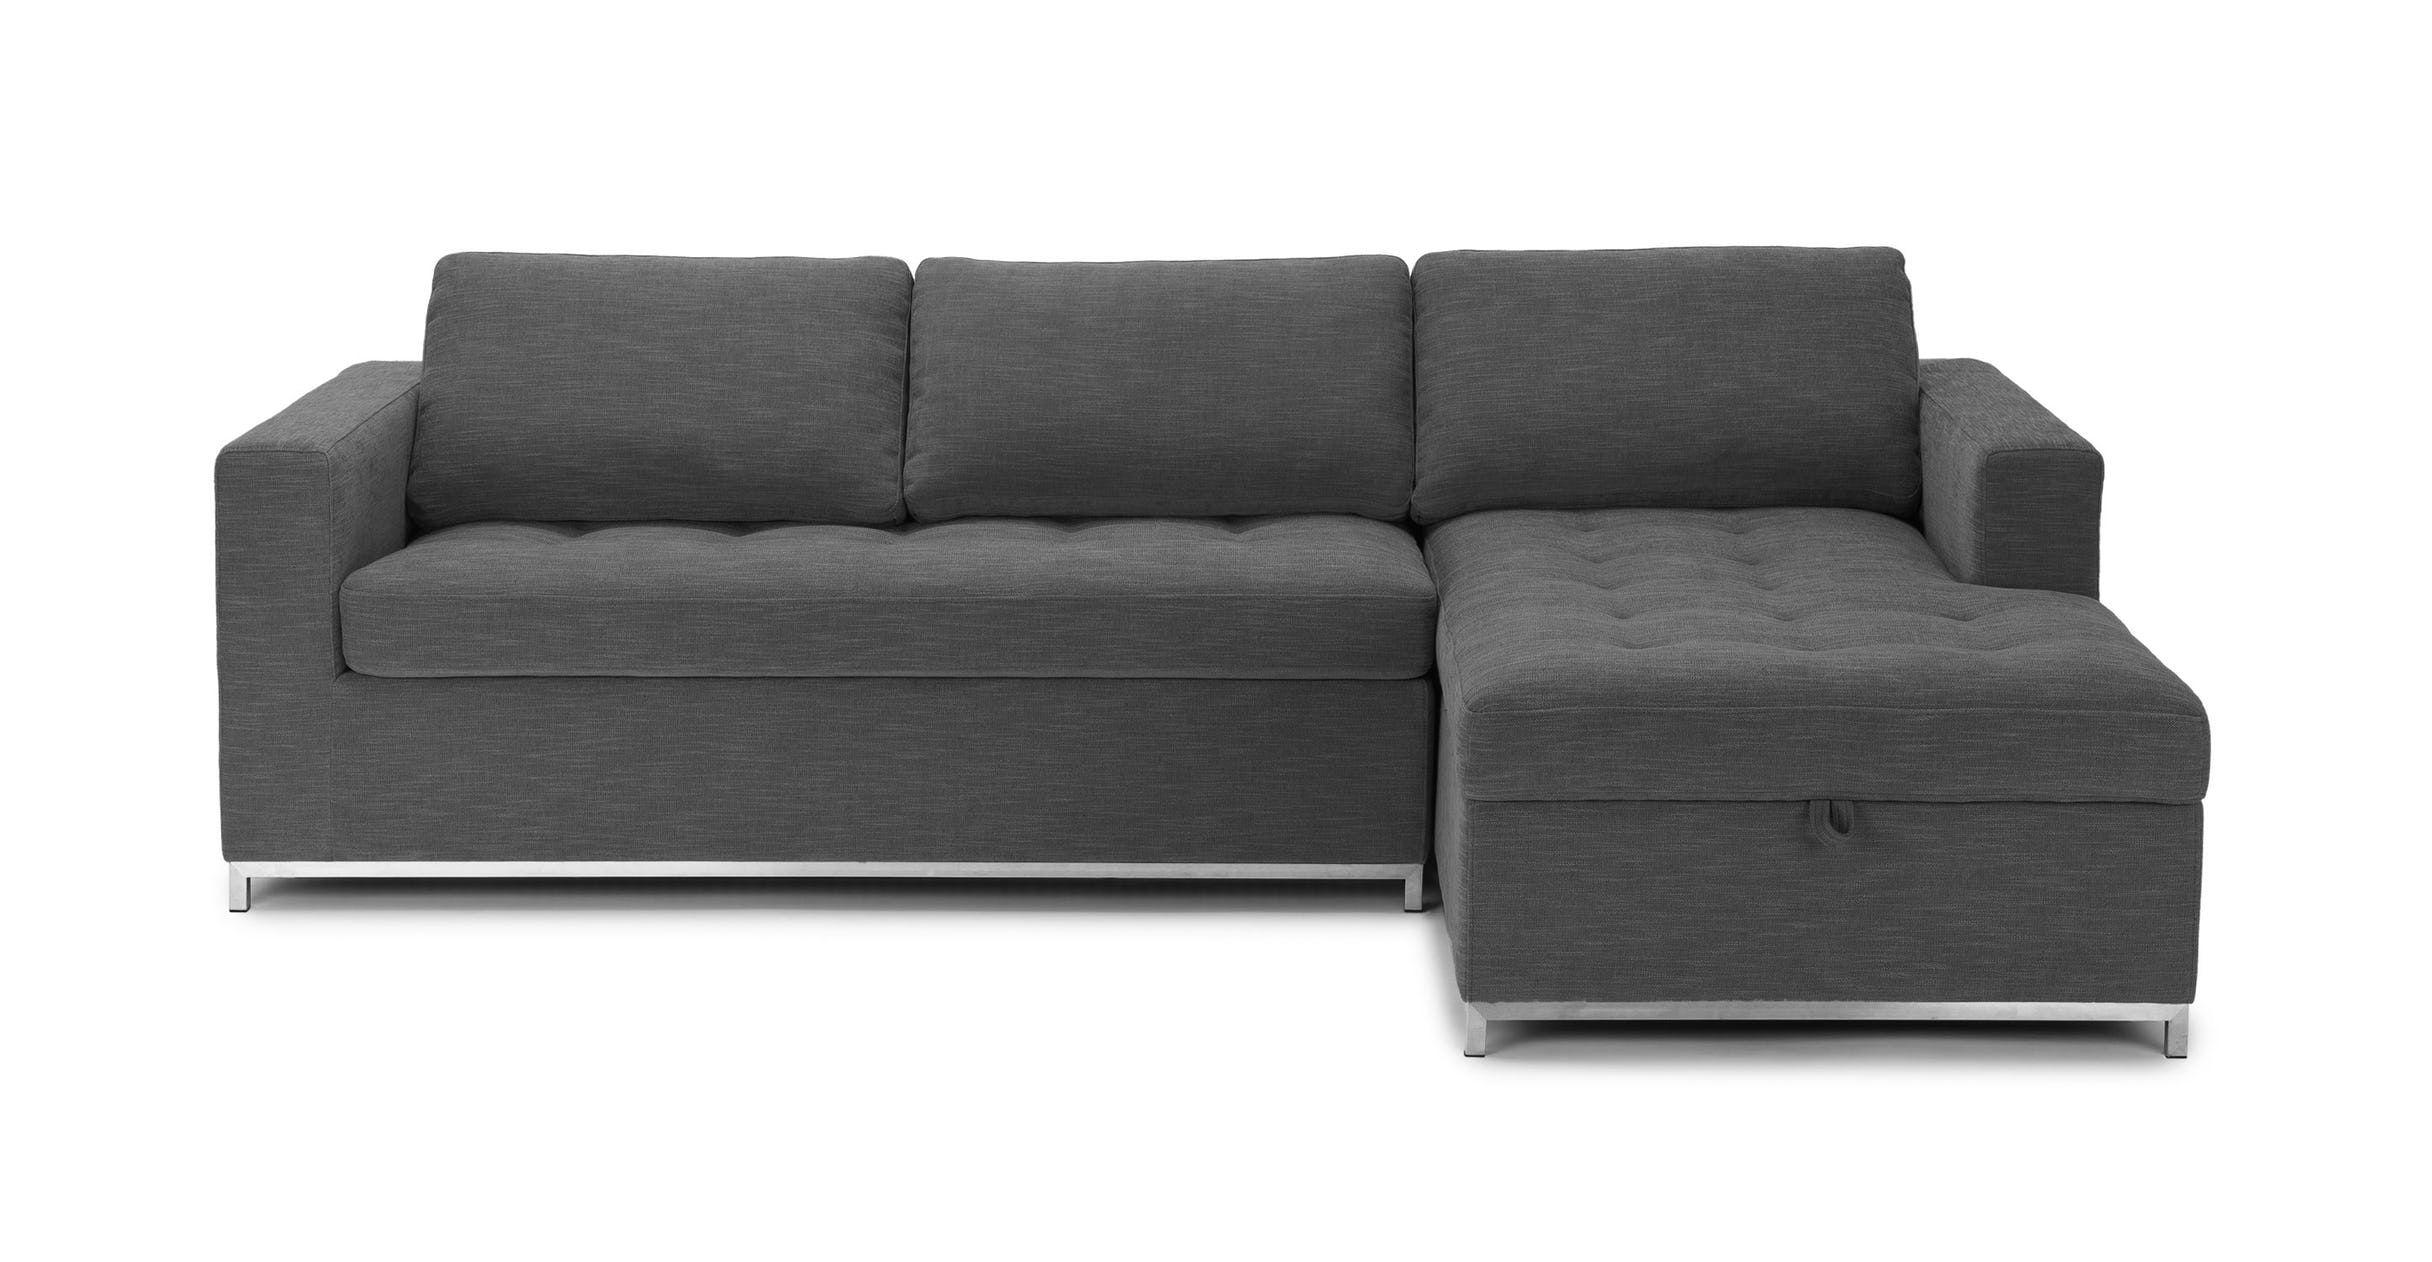 dark gray sofa bed right sectional metal legs article soma rh pinterest com